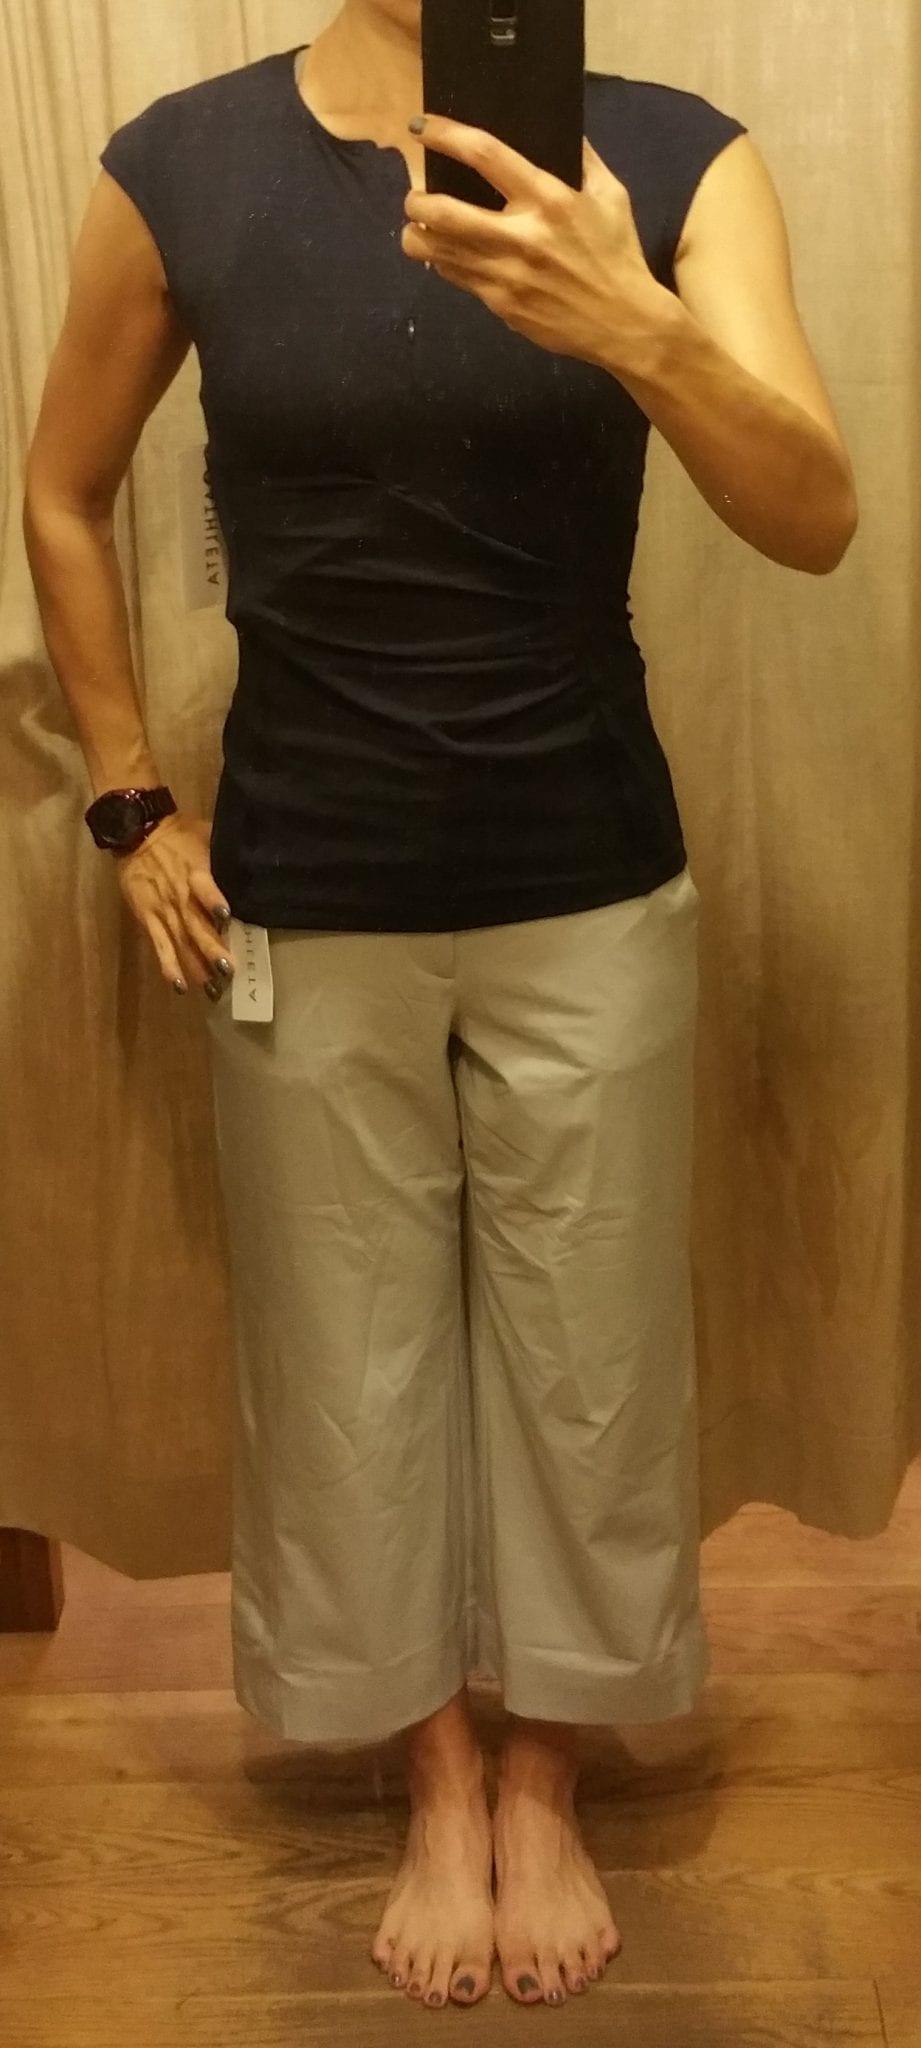 Athleta Tribeca Crop Pant and Pacifica Wrap Tank